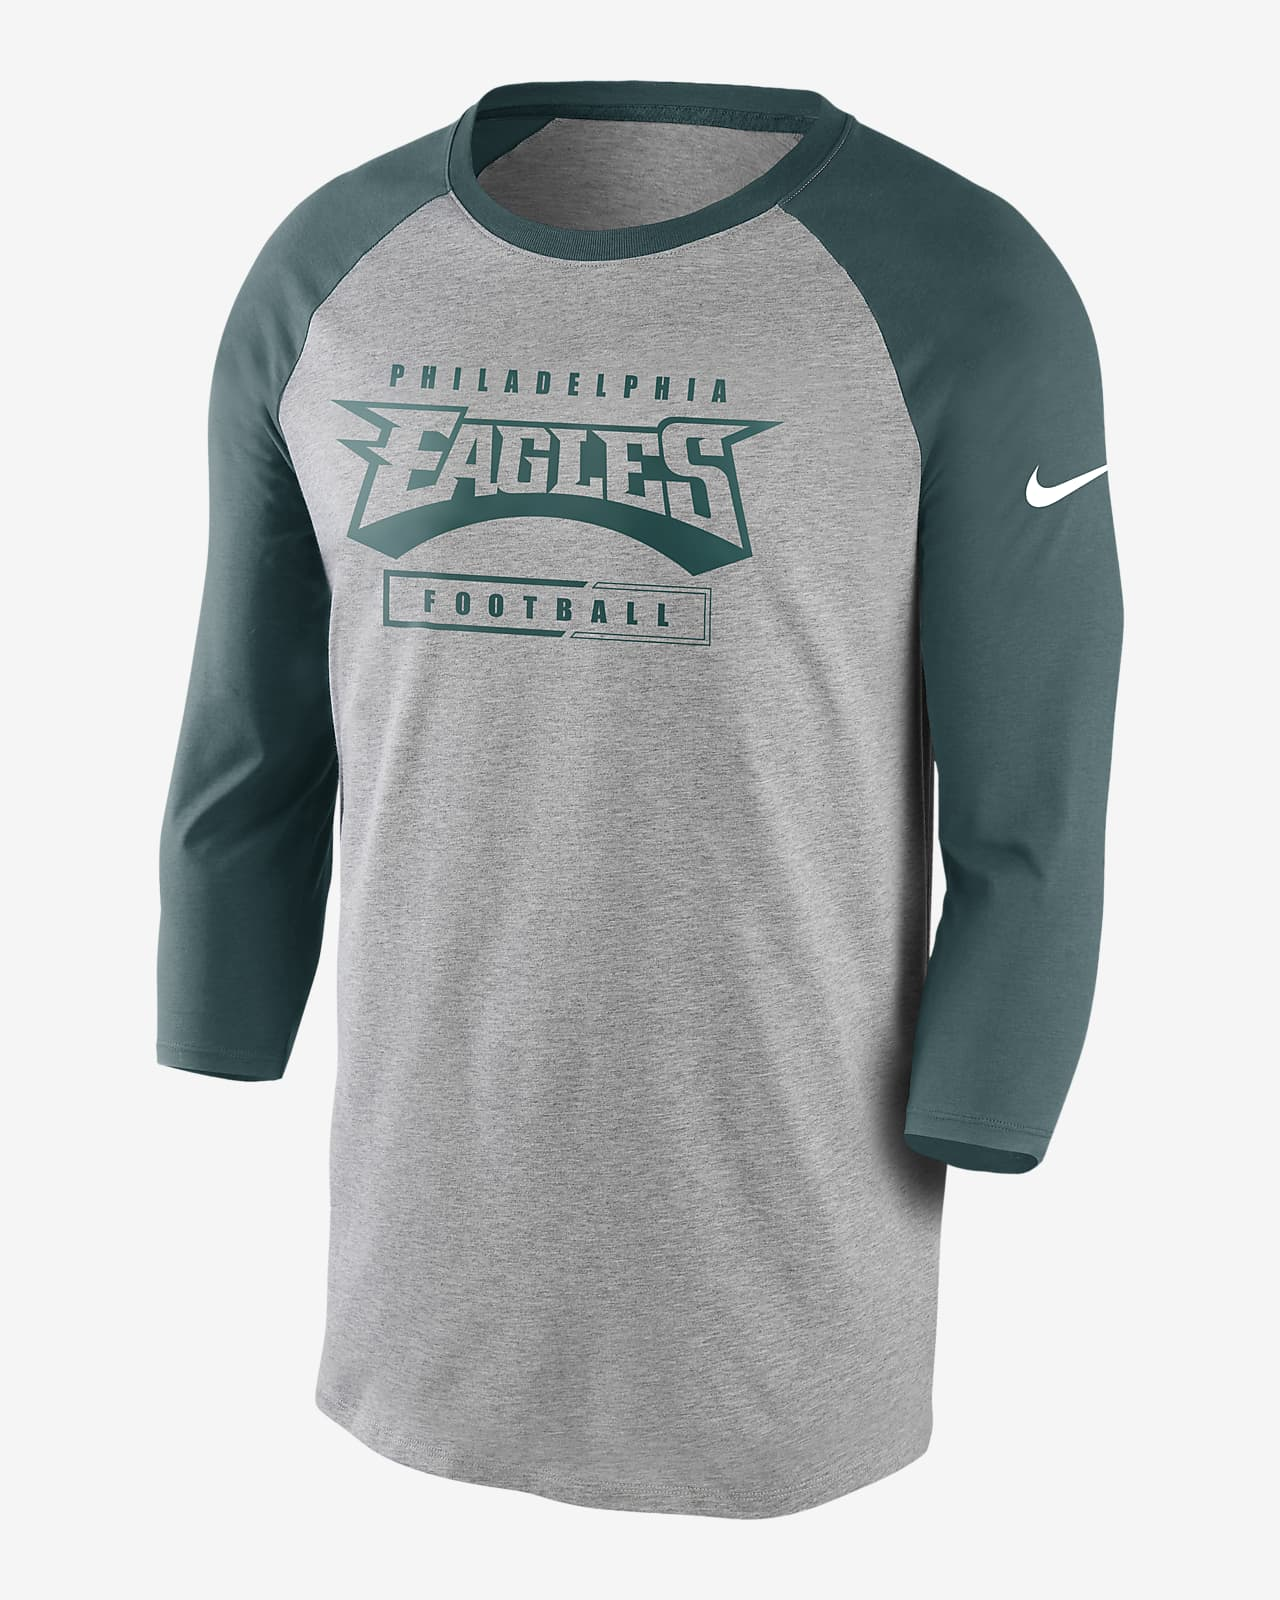 Nike Wordmark Raglan (NFL Eagles) Men's 3/4-Sleeve T-Shirt